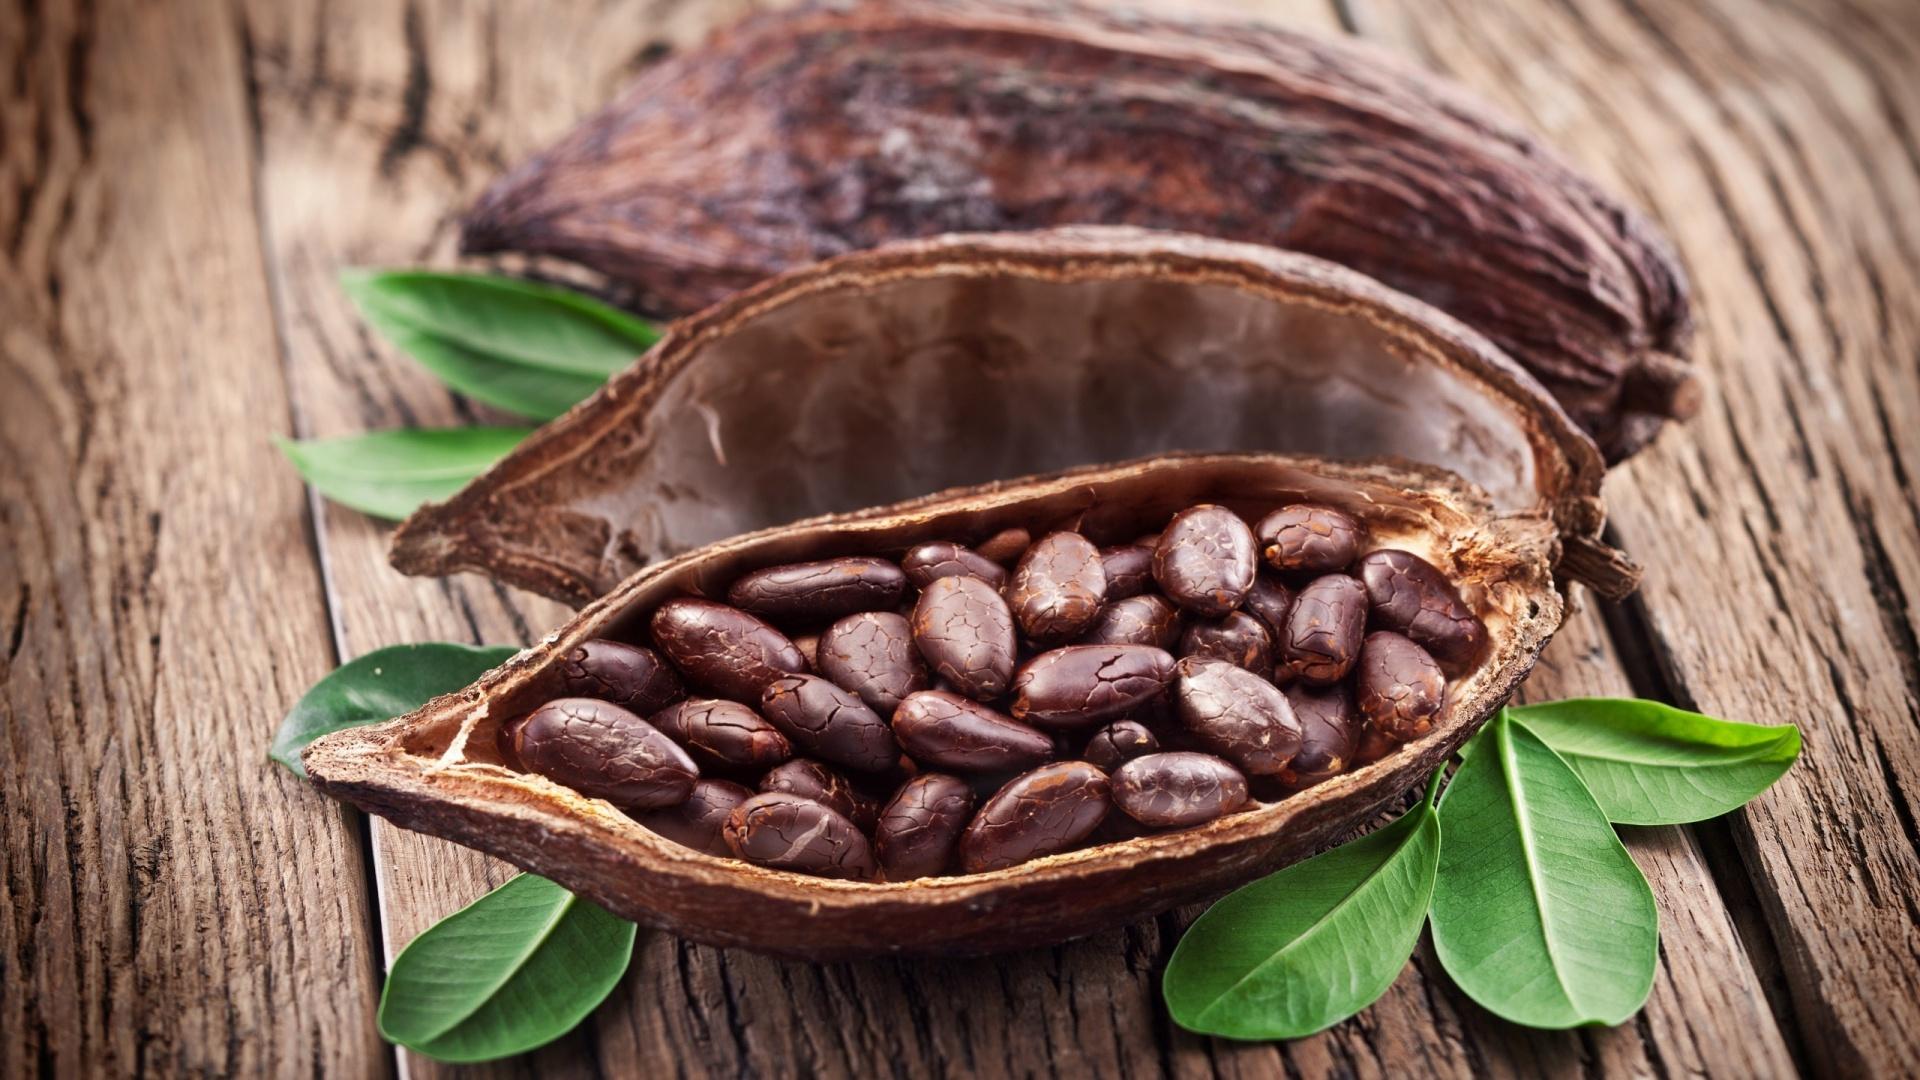 Beyoğlu Çikolata